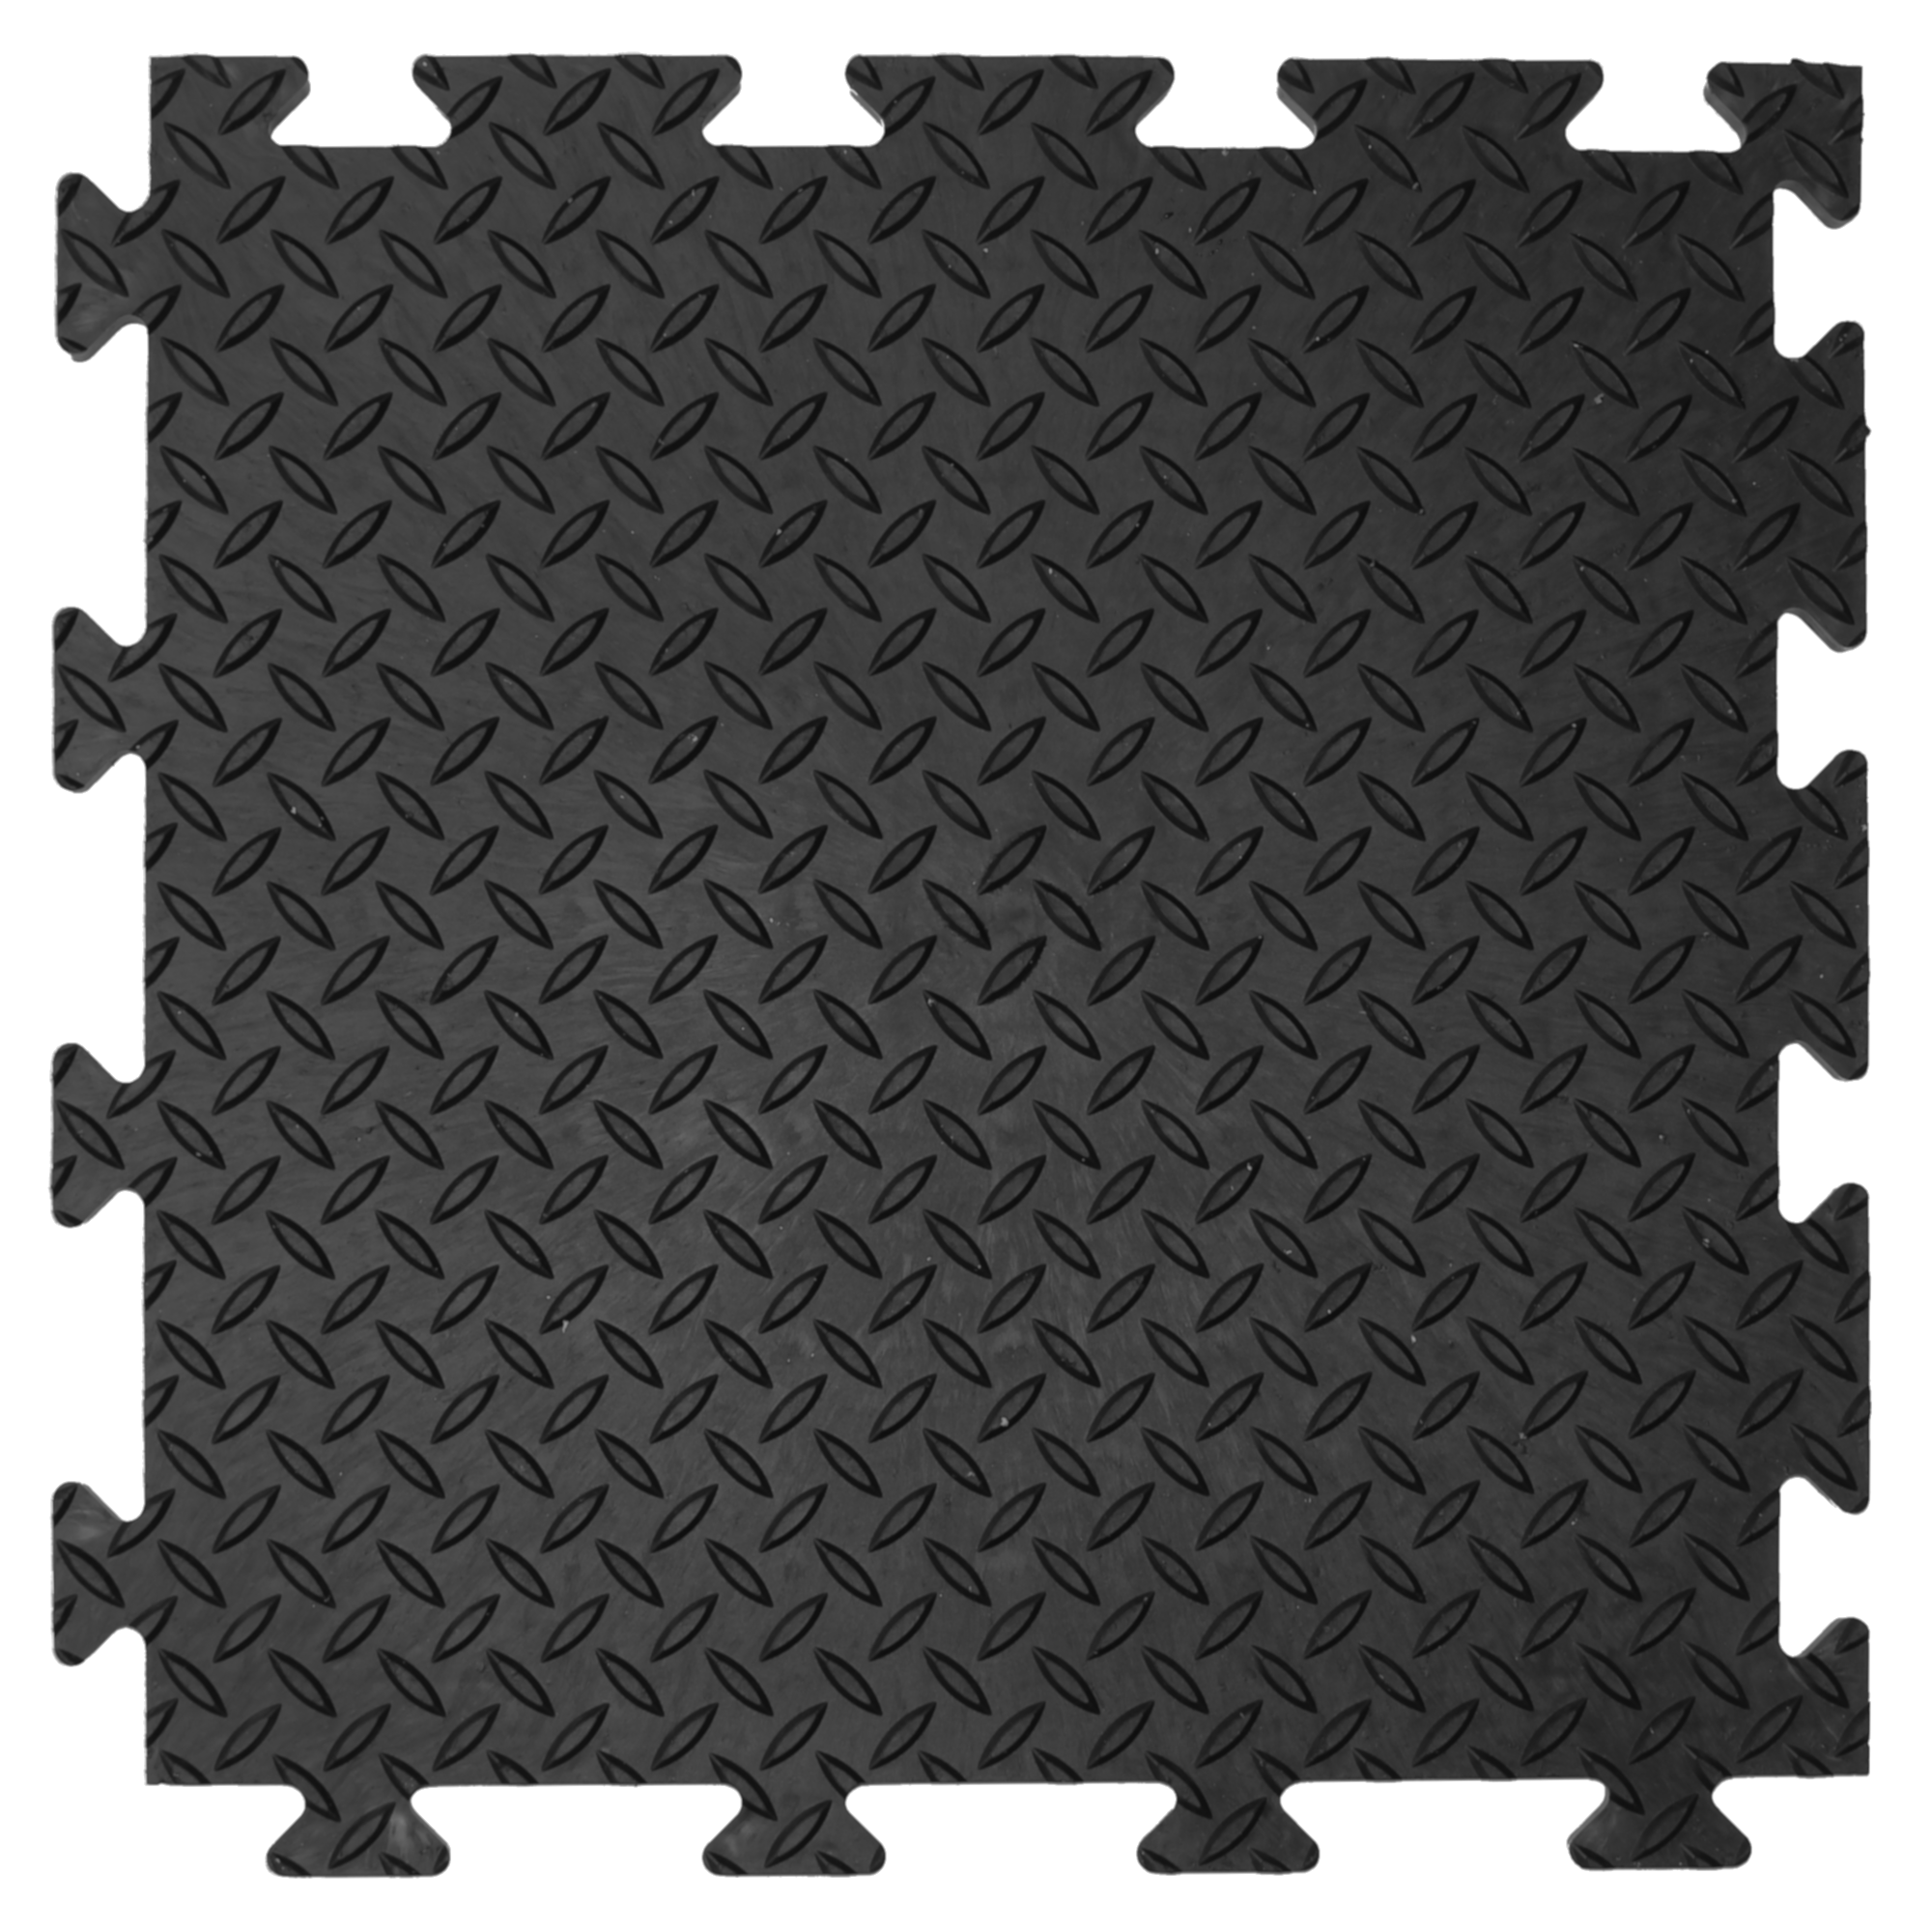 Checker New Black.png